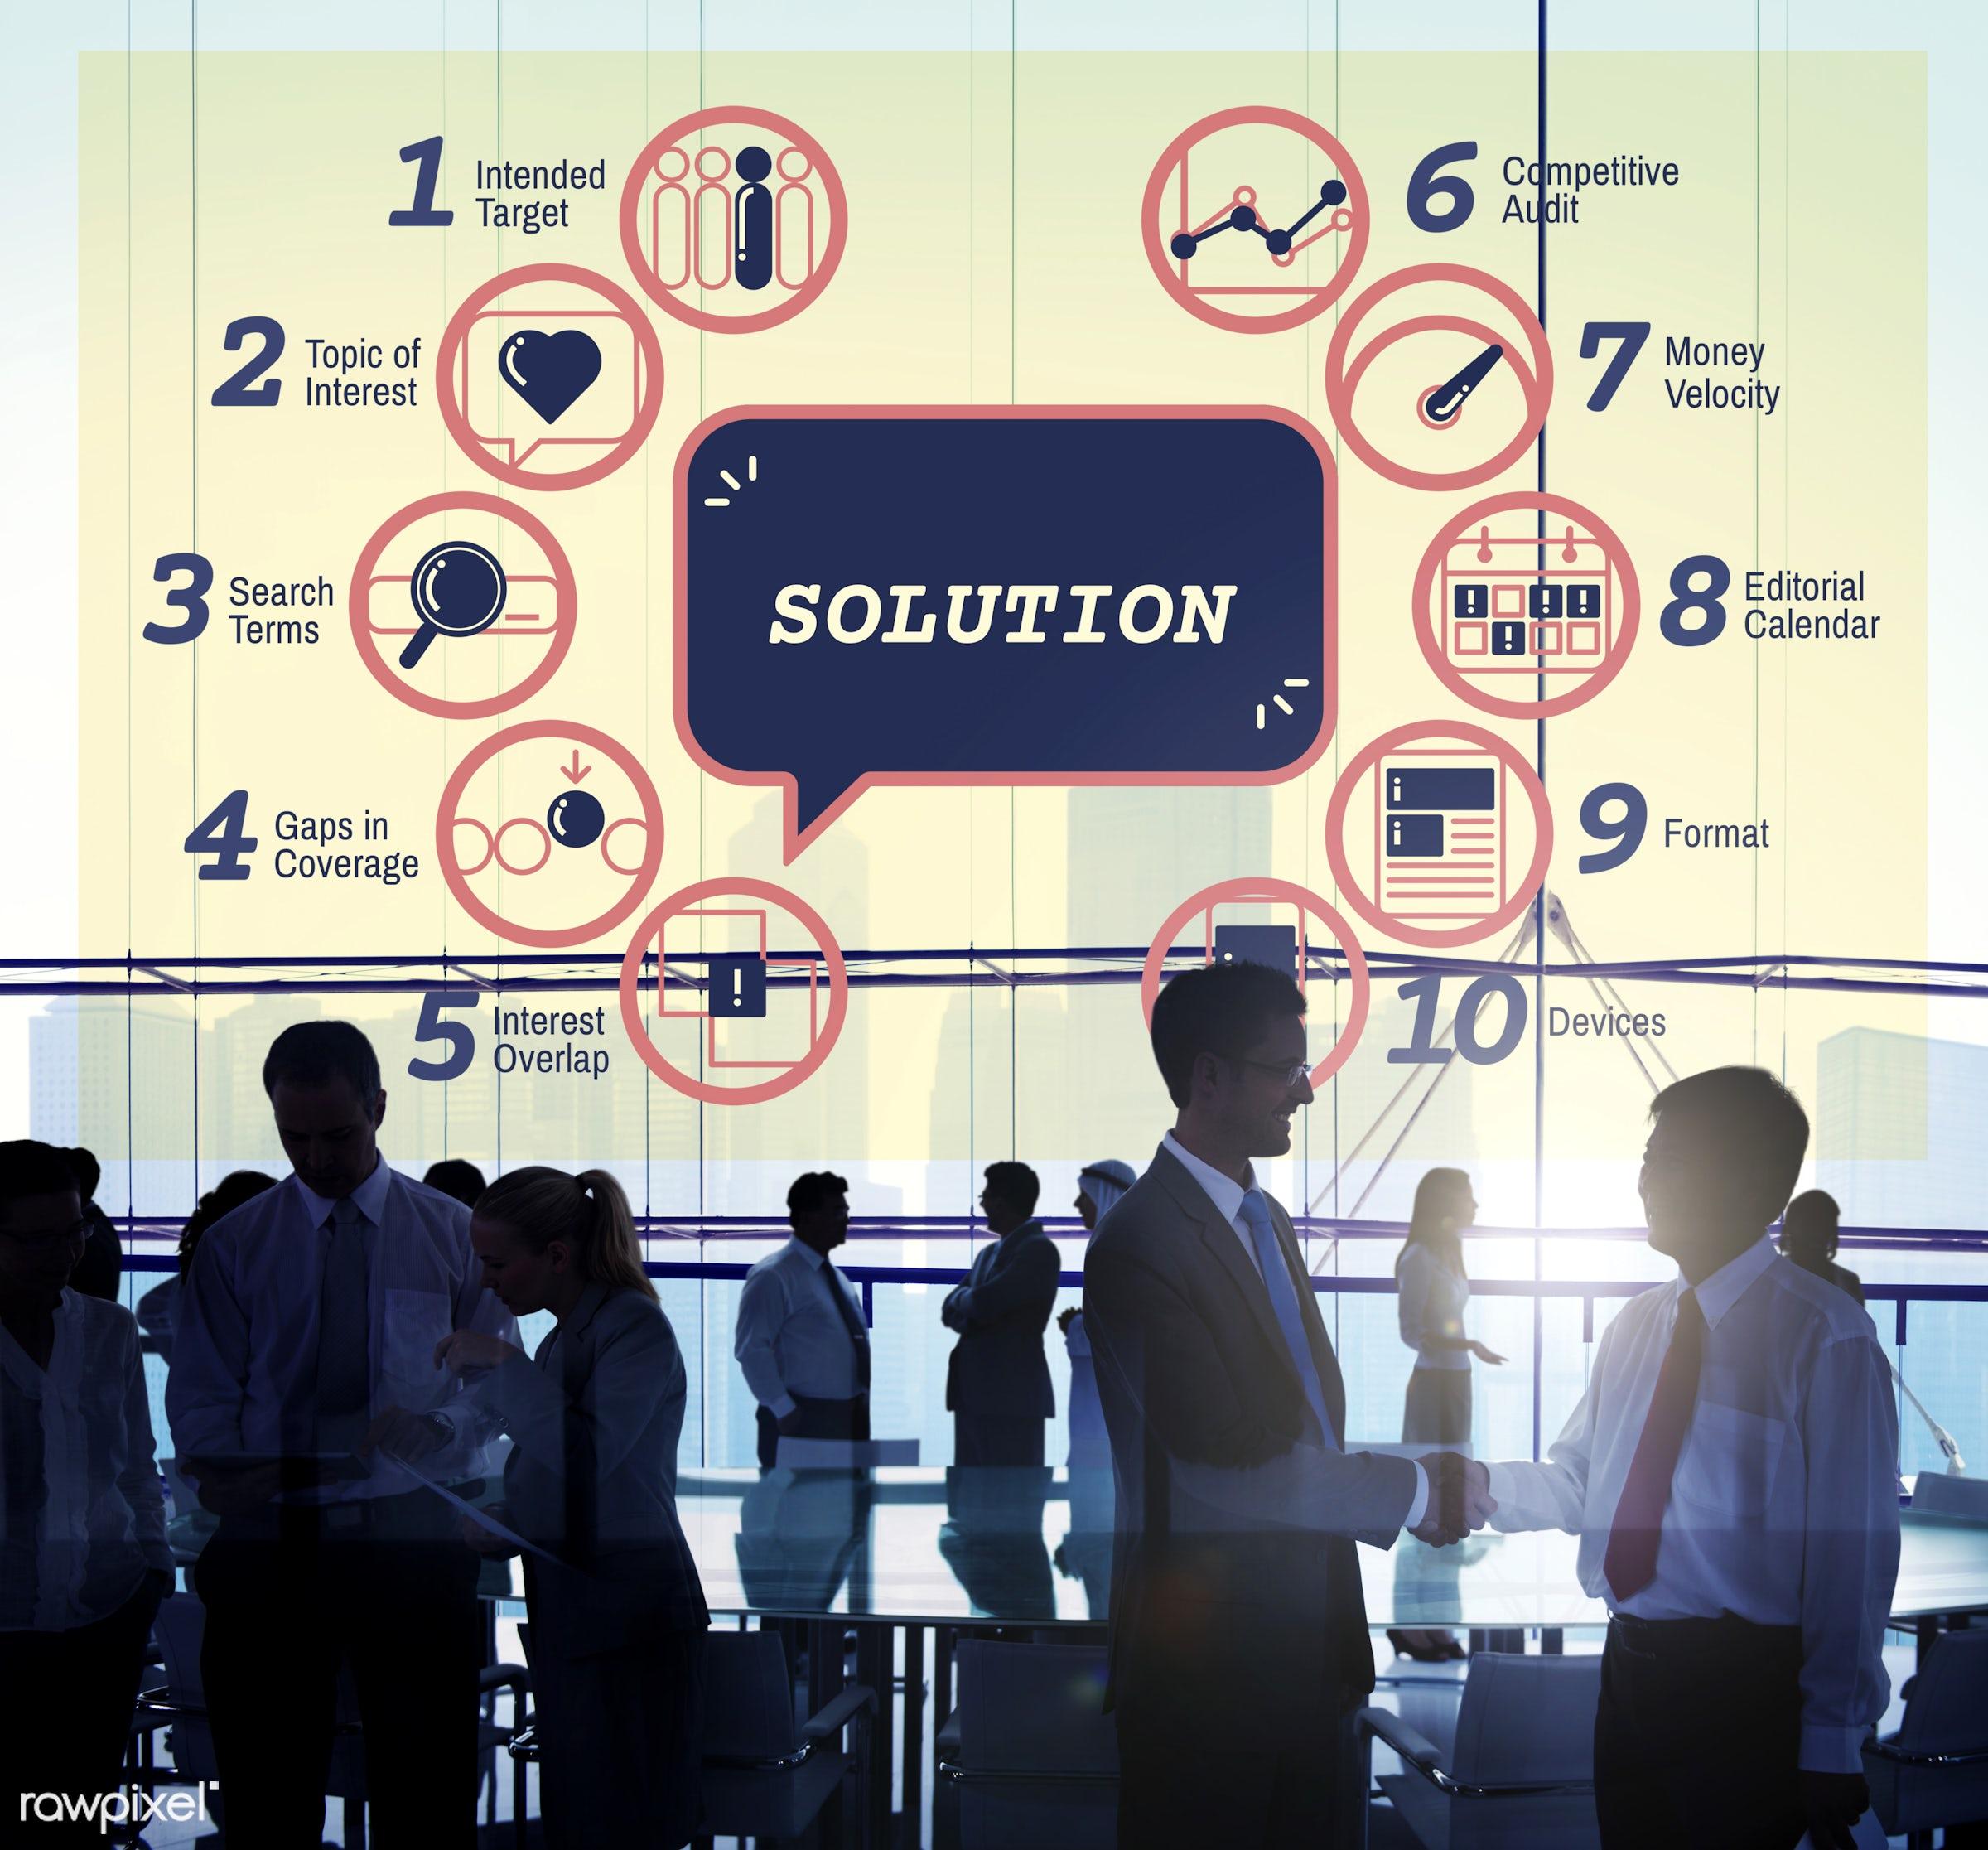 meeting, insight, analysis, analytics, analyze, big data, brainstorming, building, business, businessmen, businesswomen,...